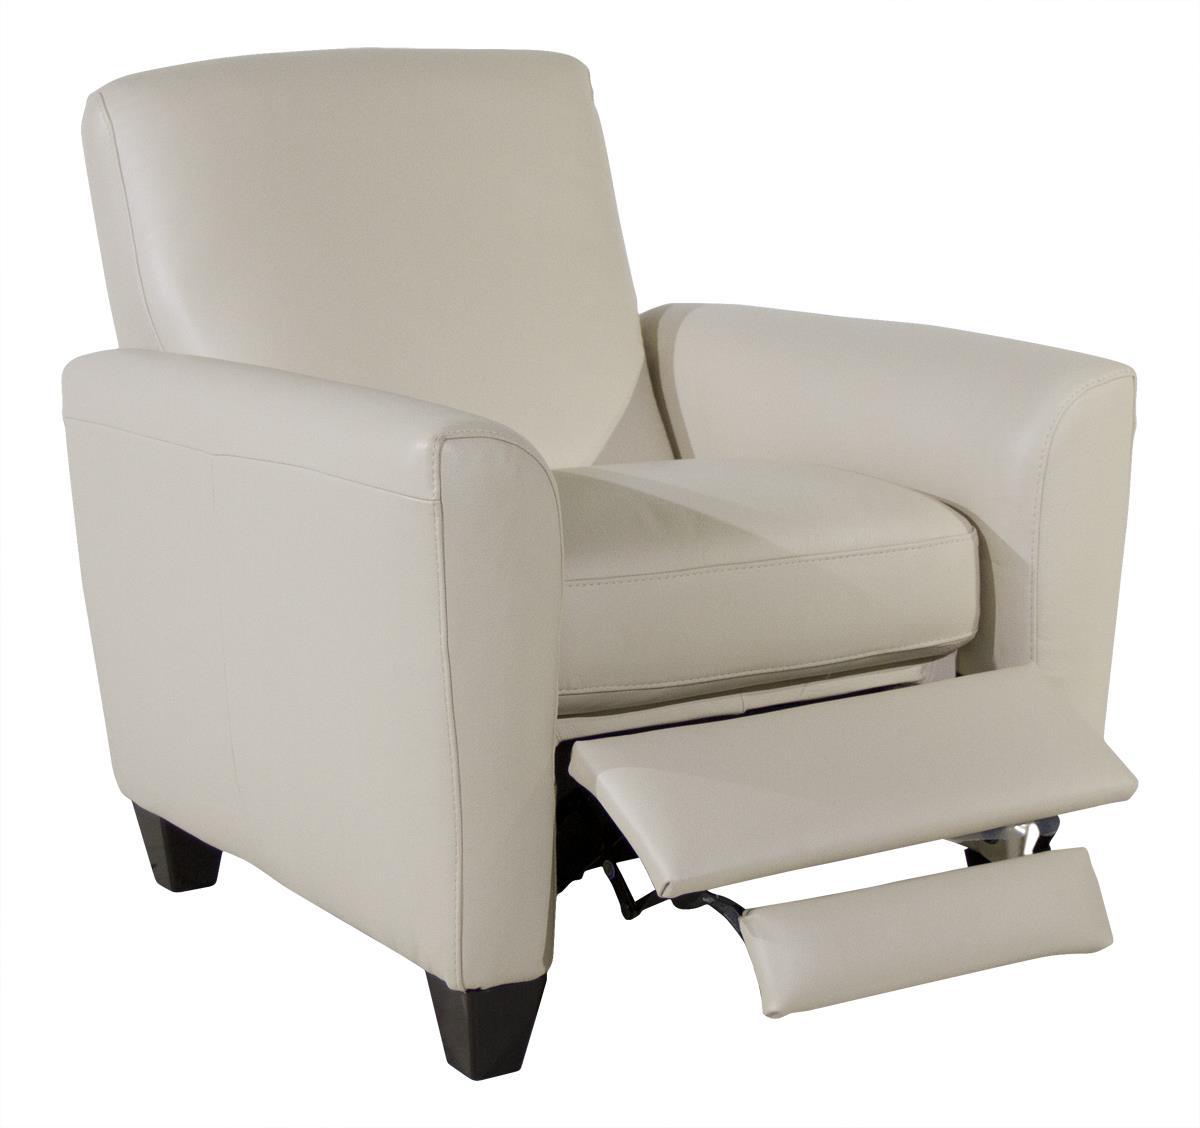 Lino Reclining Armchair by Natuzzi Editions  sc 1 st  HomeWorld Furniture & Natuzzi Editions Lino Reclining Armchair - HomeWorld Furniture ... islam-shia.org